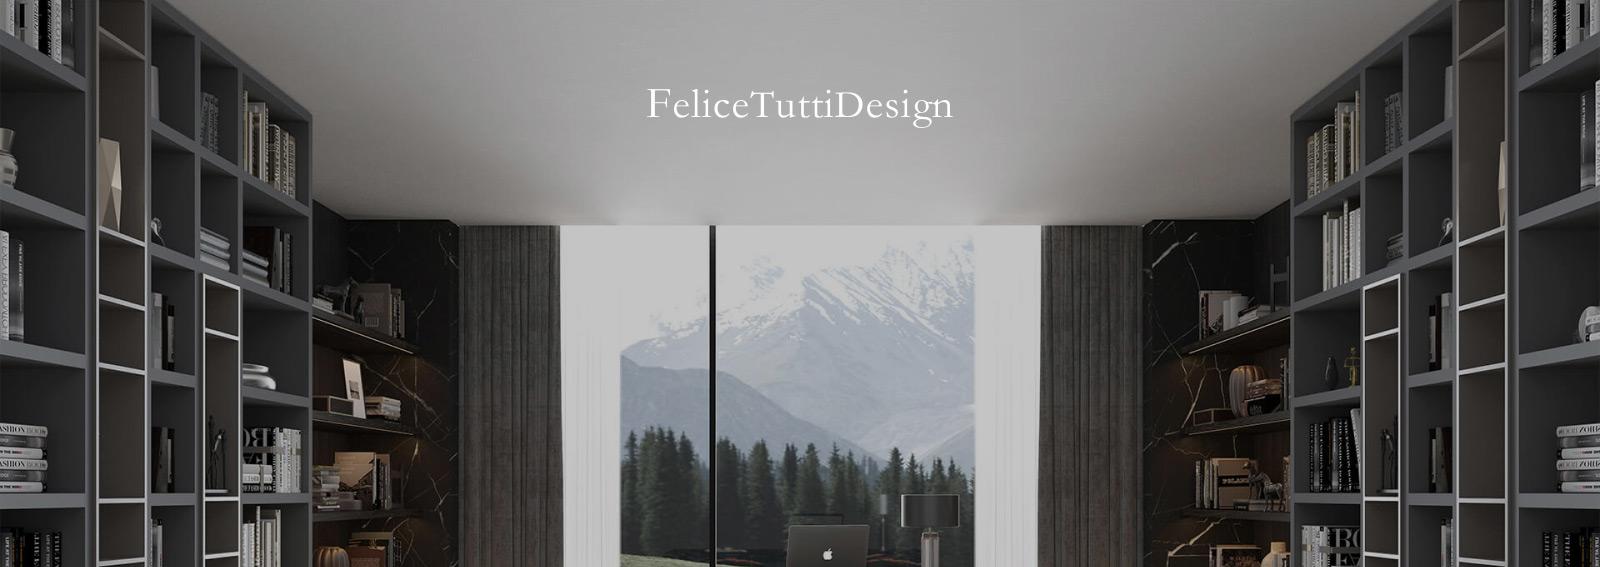 FeliceTuttiDesign 全案设计依然延续了意式极简主义的现代风格,按照横向空间理论设计原理,以期达到人居环境所需的最佳状态。FeliceTuttiDesign 全案设计强调形态与质感的体现,由建筑物对空间的包裹更显神奇,在强调视觉氛围感受的同时使空间的立体展示更加明显。